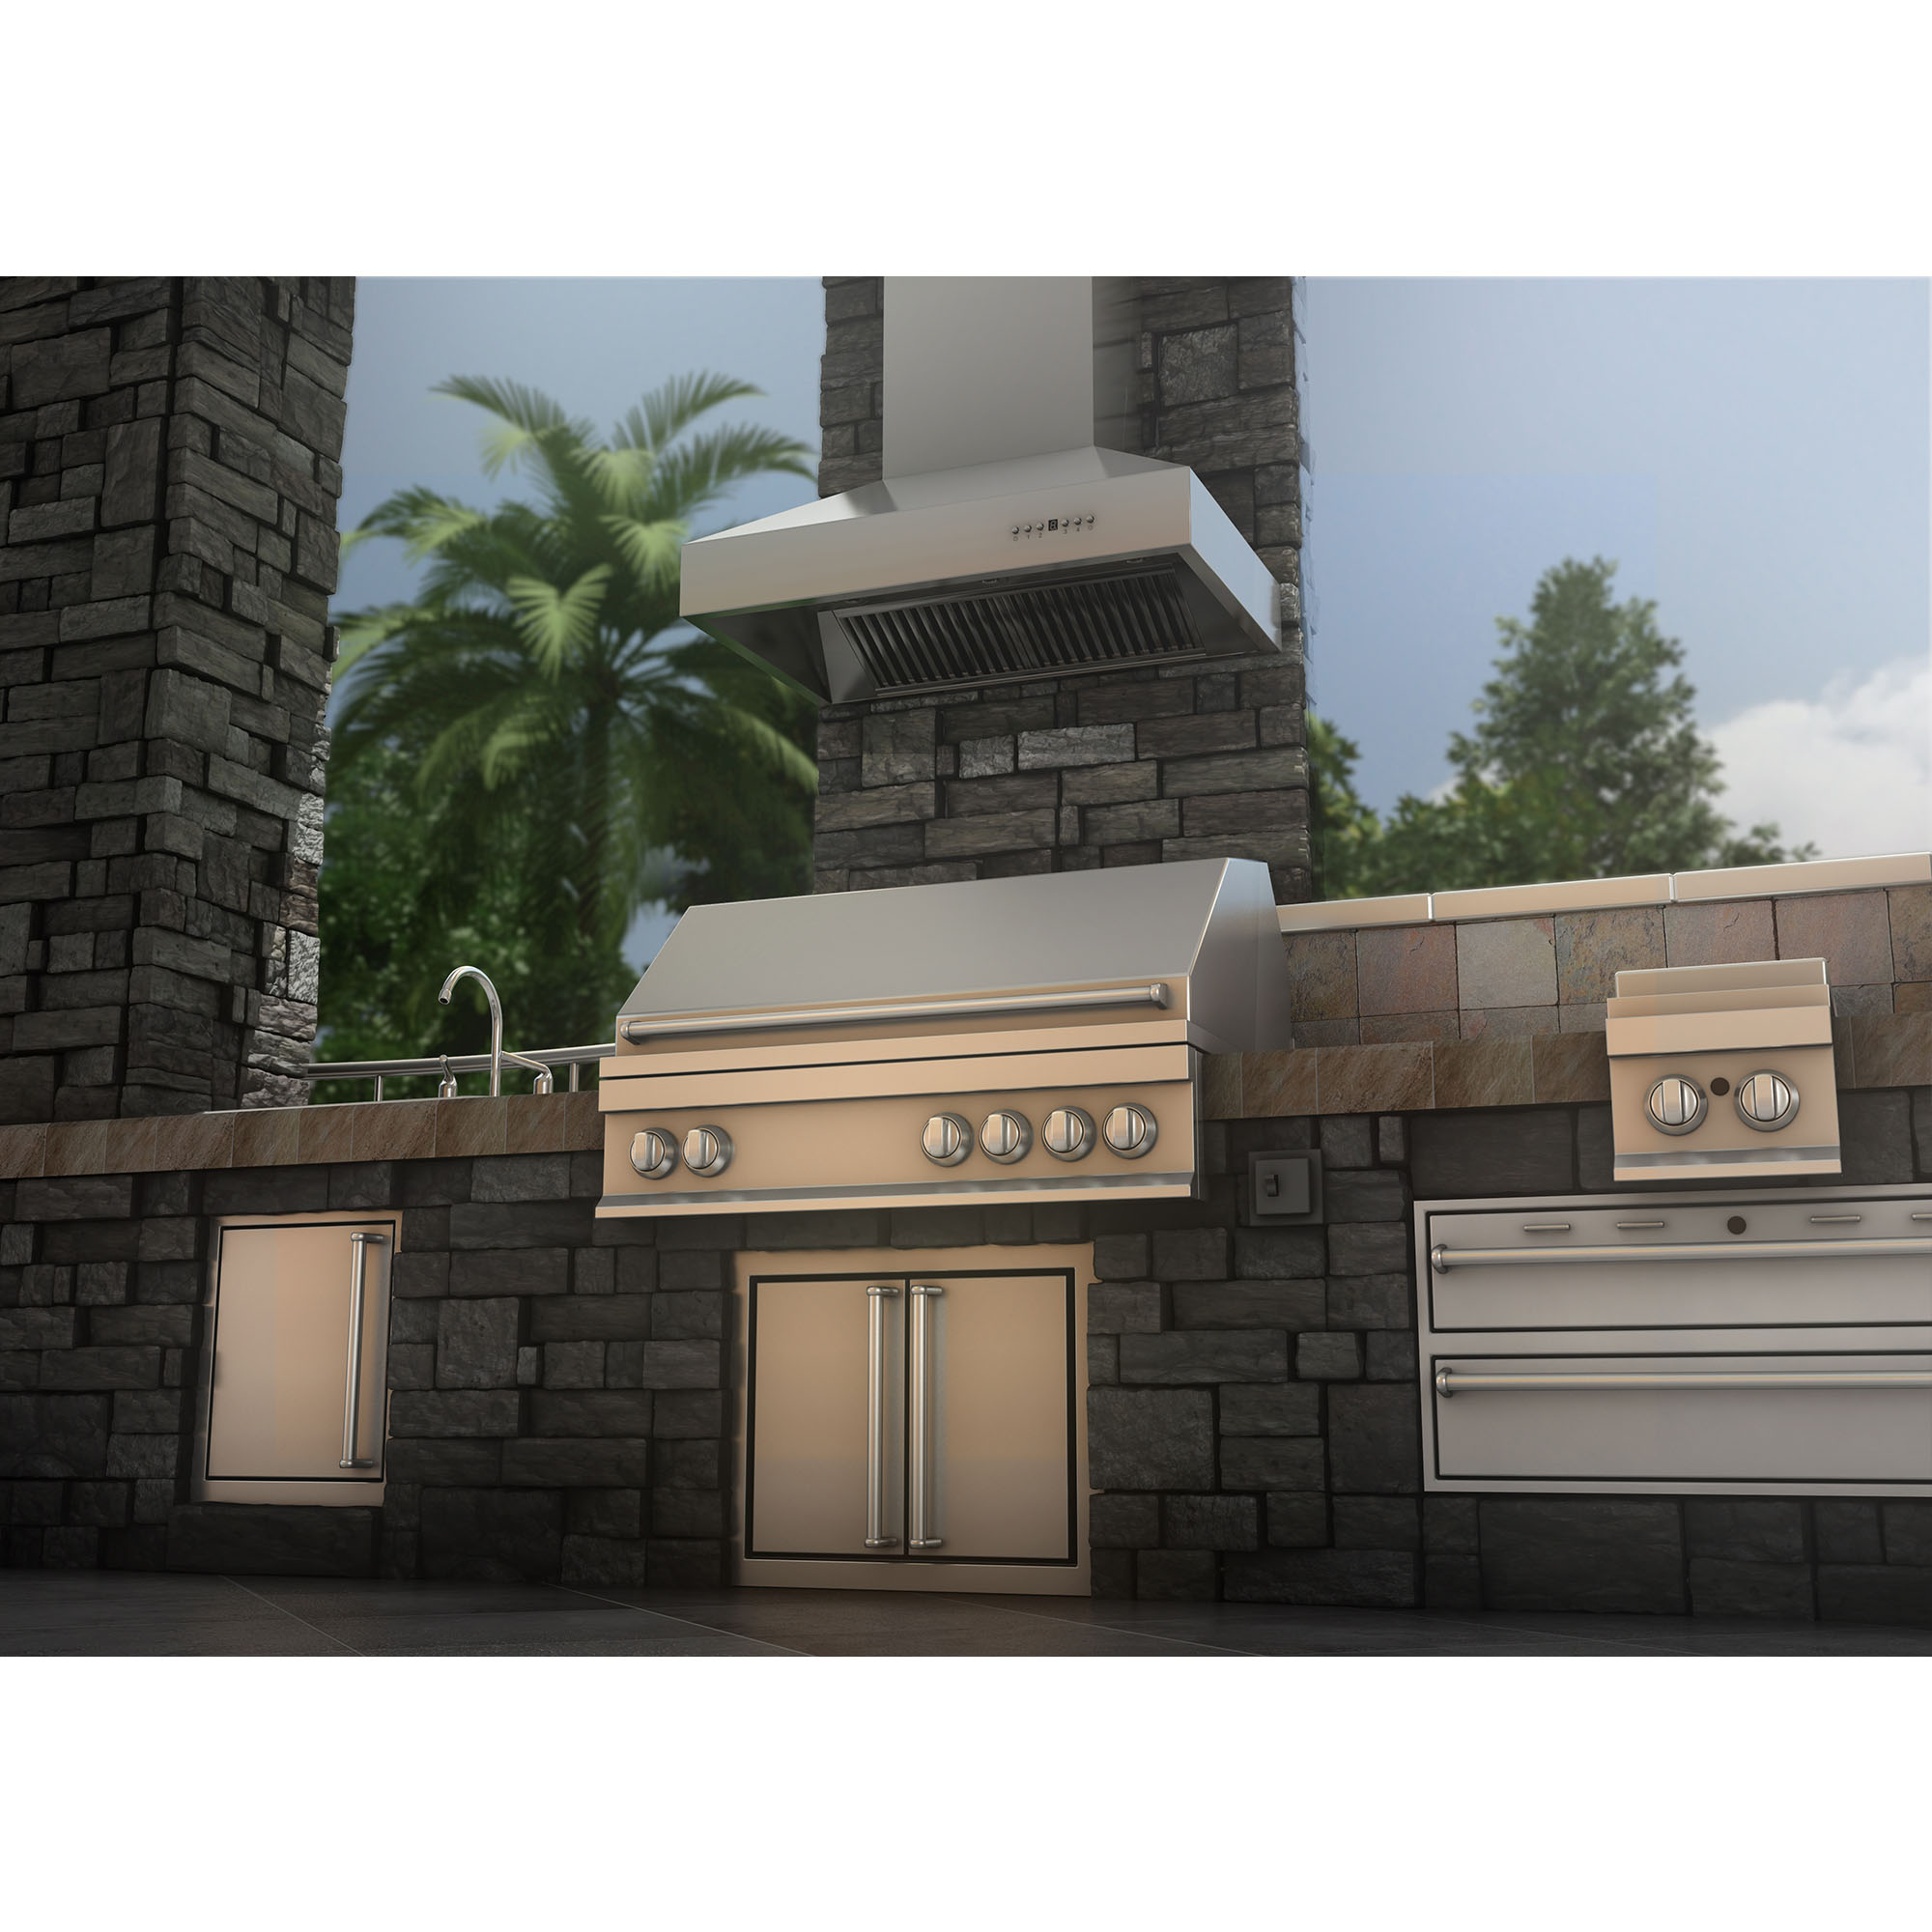 667_697_New_Outdoor_Kitchen_Wall_Hoods_Cam_03.jpg